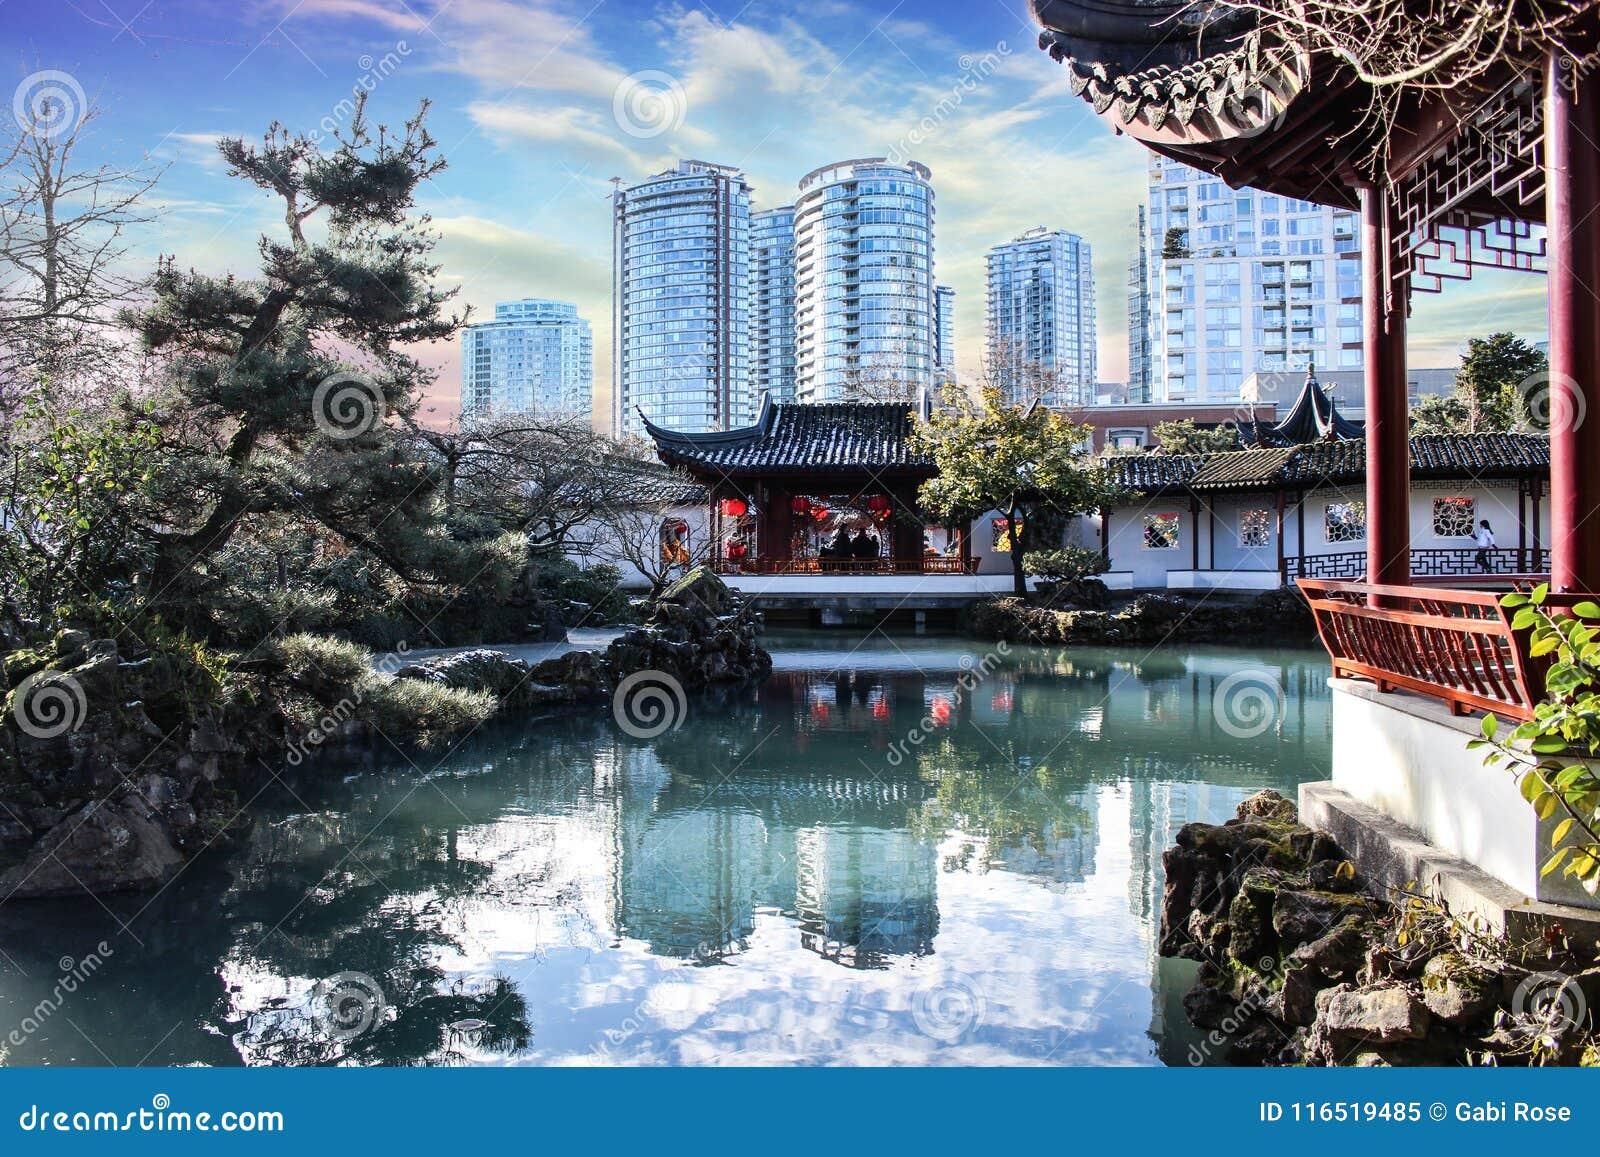 beautiful oriental gardentemple with an amazing sky chinese new yearfestival - Oriental Garden